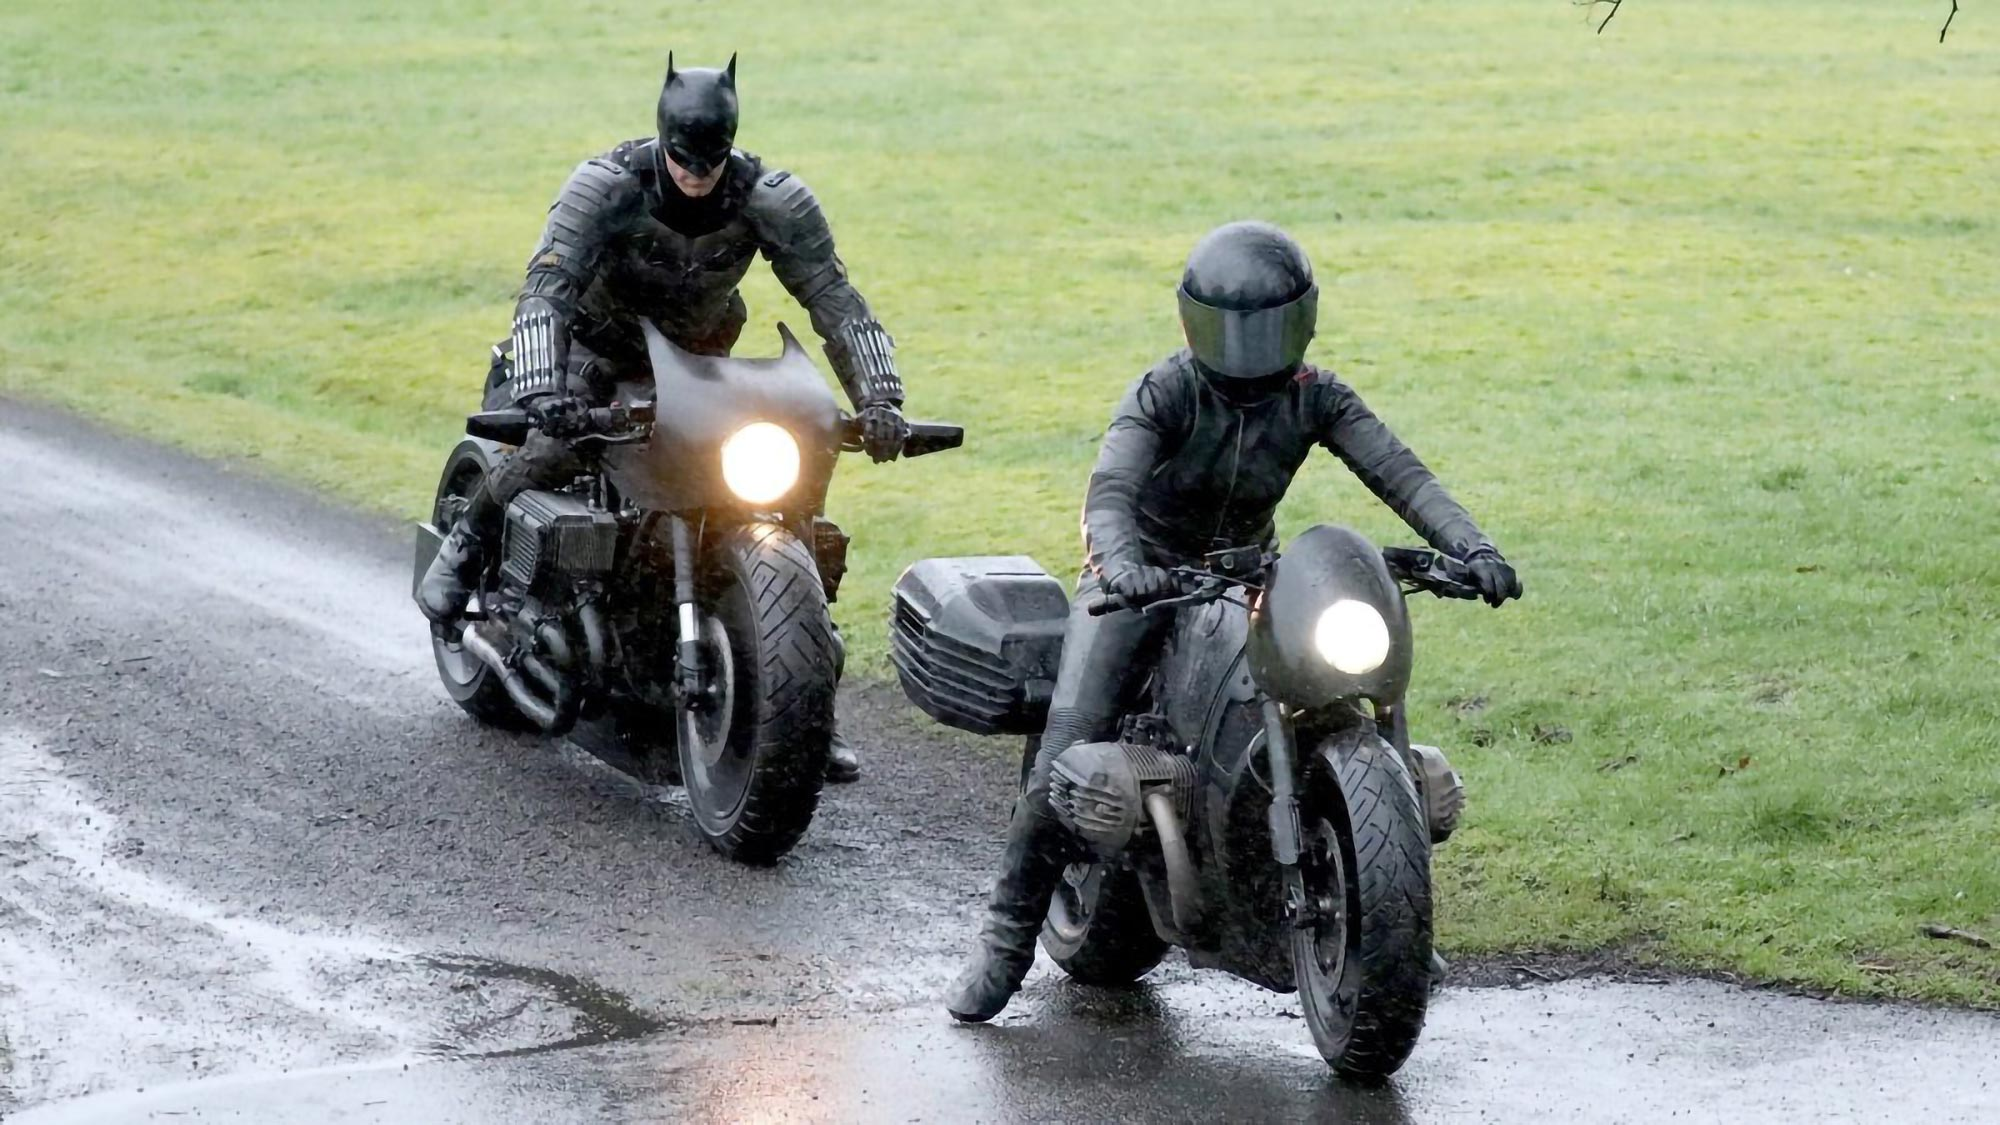 Matt Reeves' The Batman Movie Batcycle